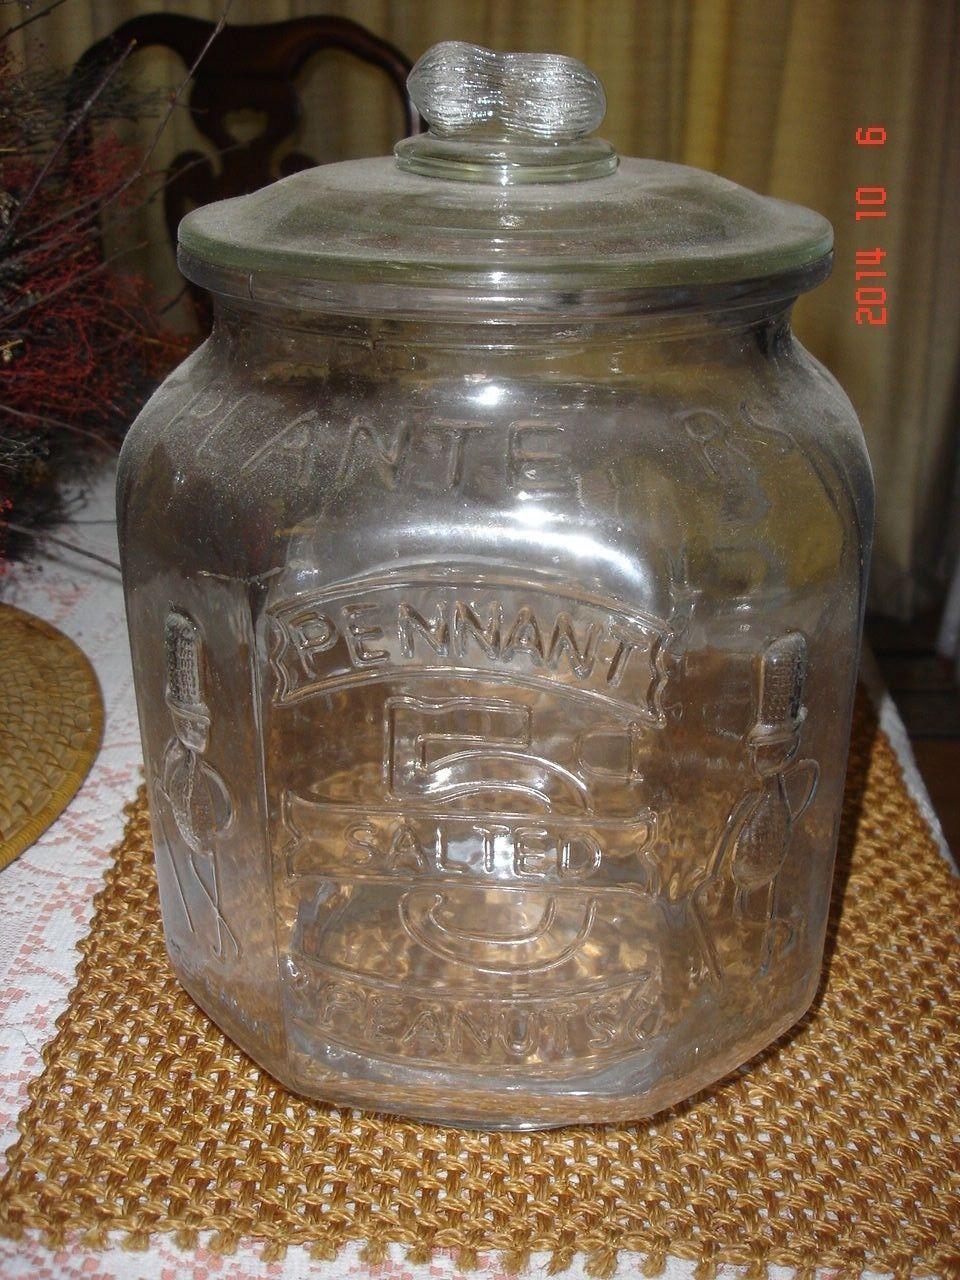 Antique Planter's Peanut Gl Display Jar w Lid | eBay | General ... on planters snack mix, planters peanuts candies, peanuts fruit snacks, planters mixed nuts, planters corn snacks,